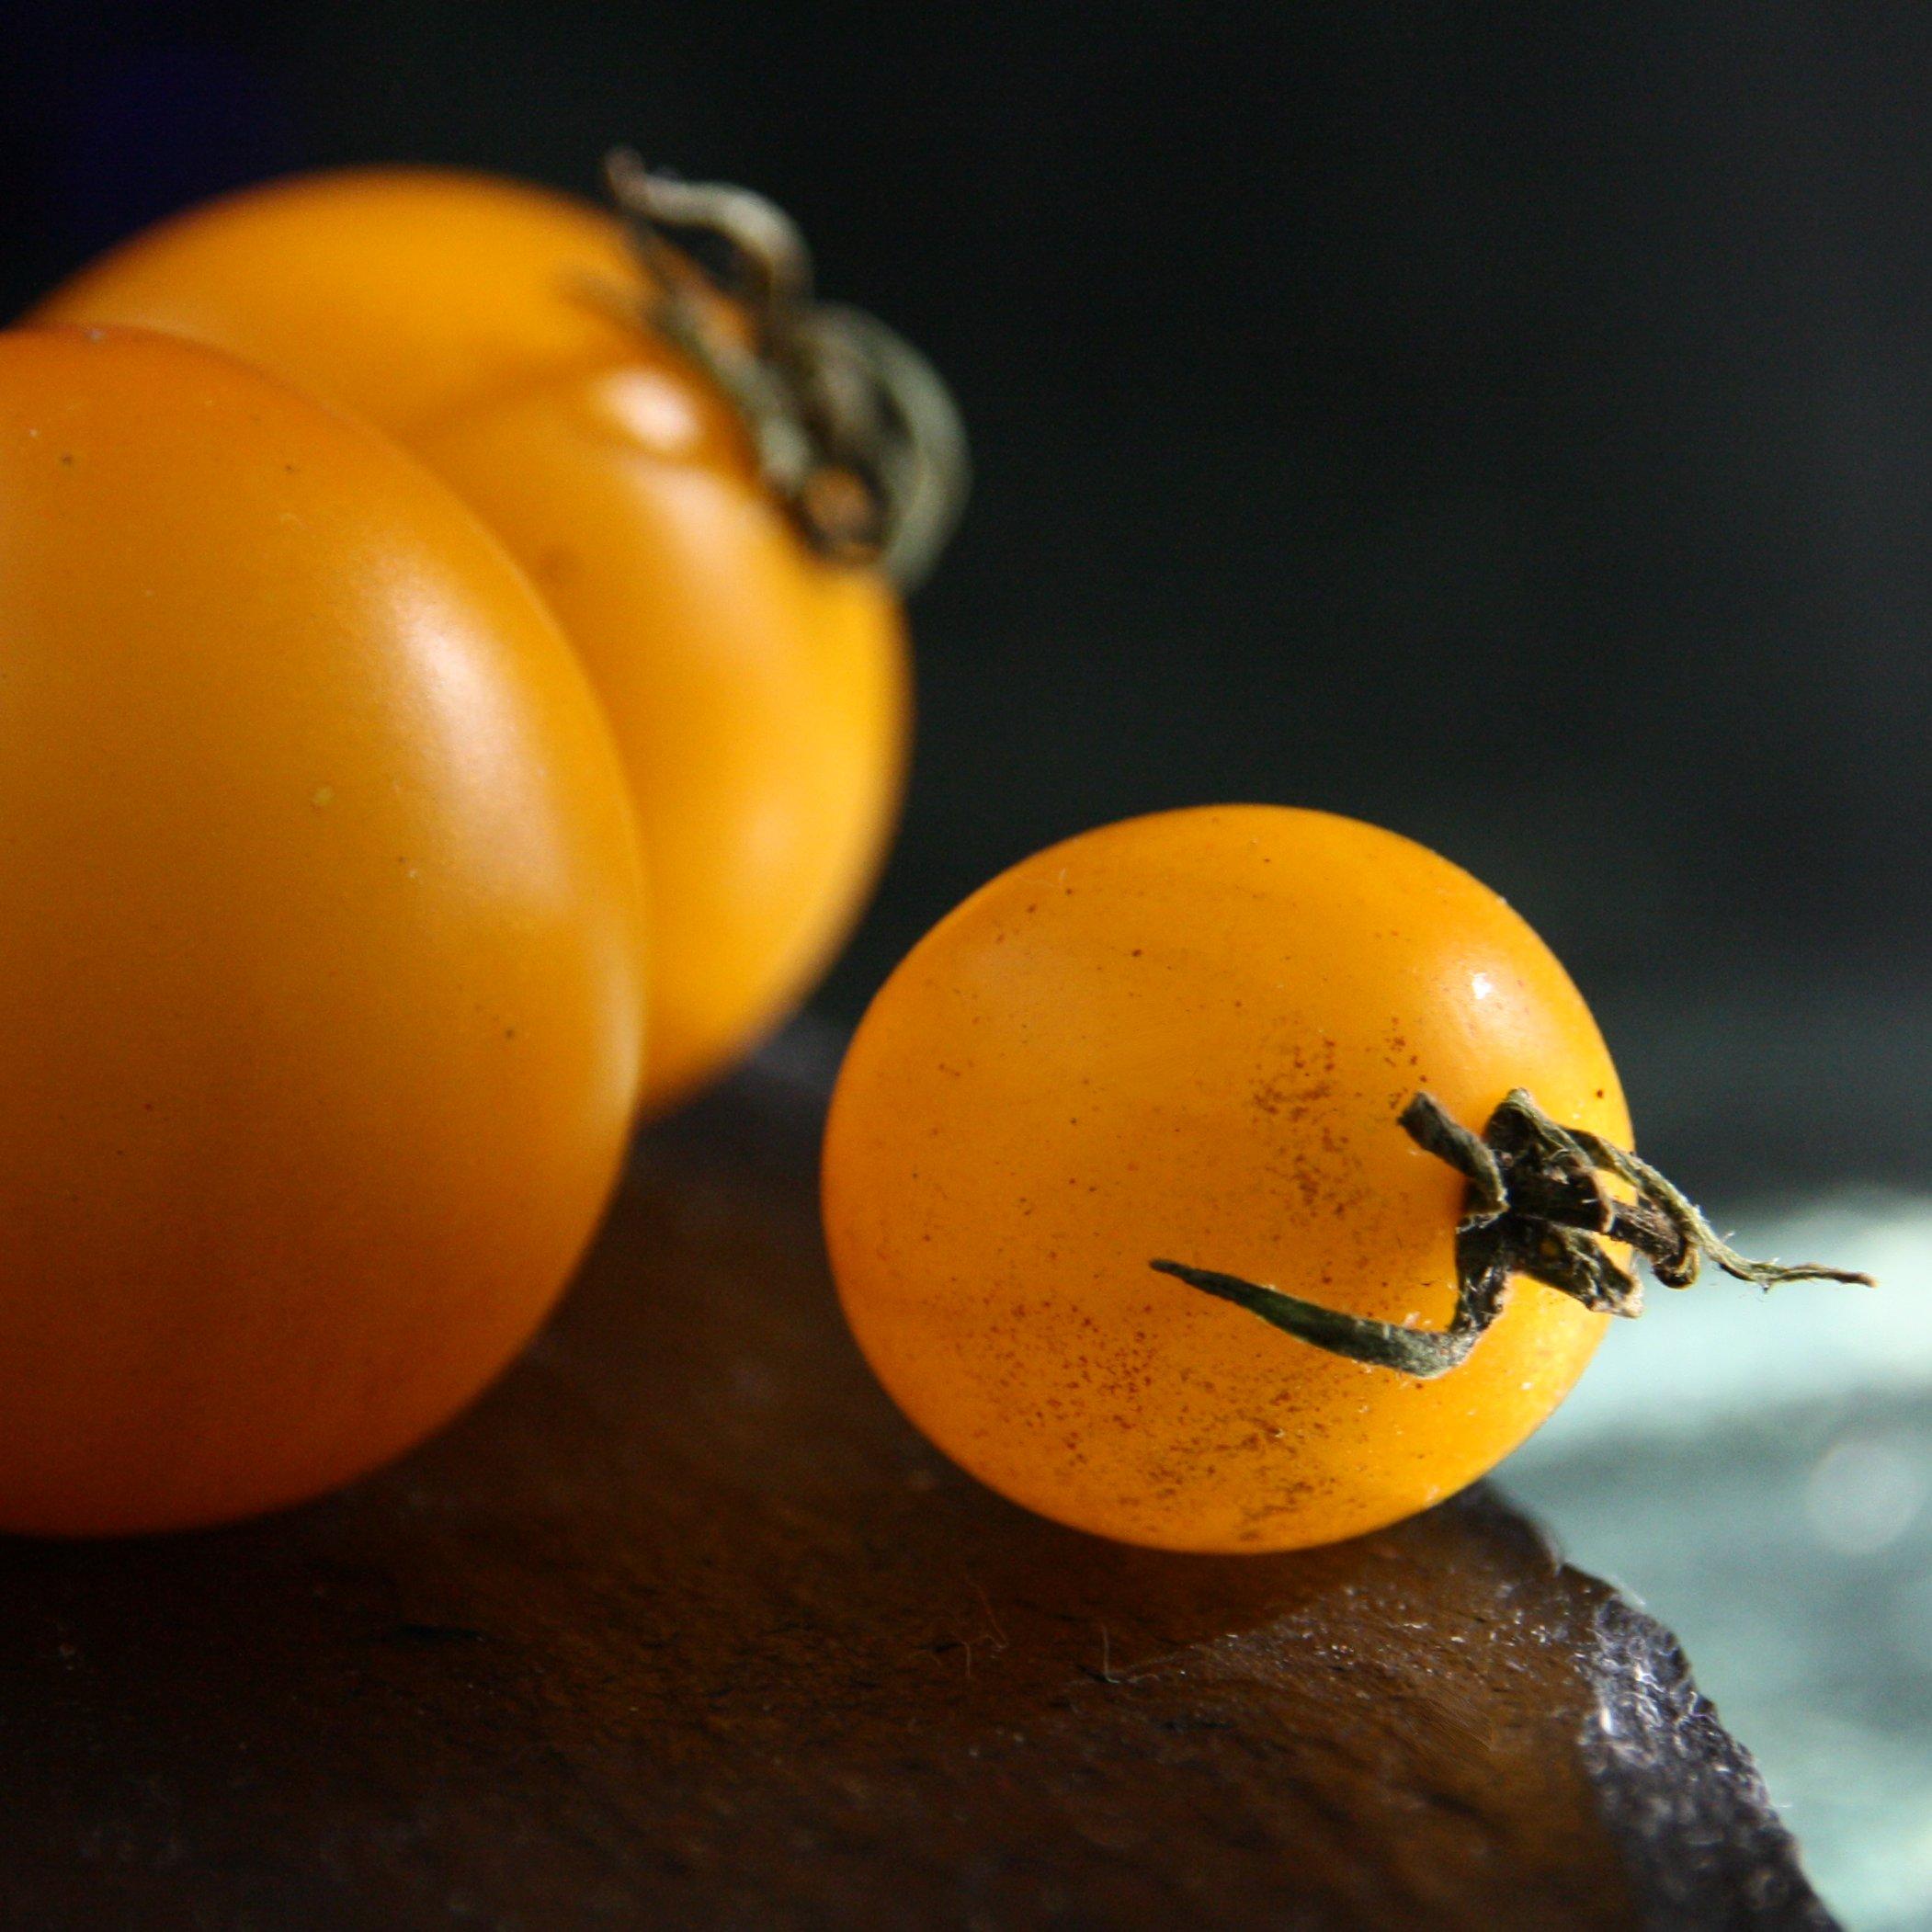 tomato, vermeer, fruit, vegetable